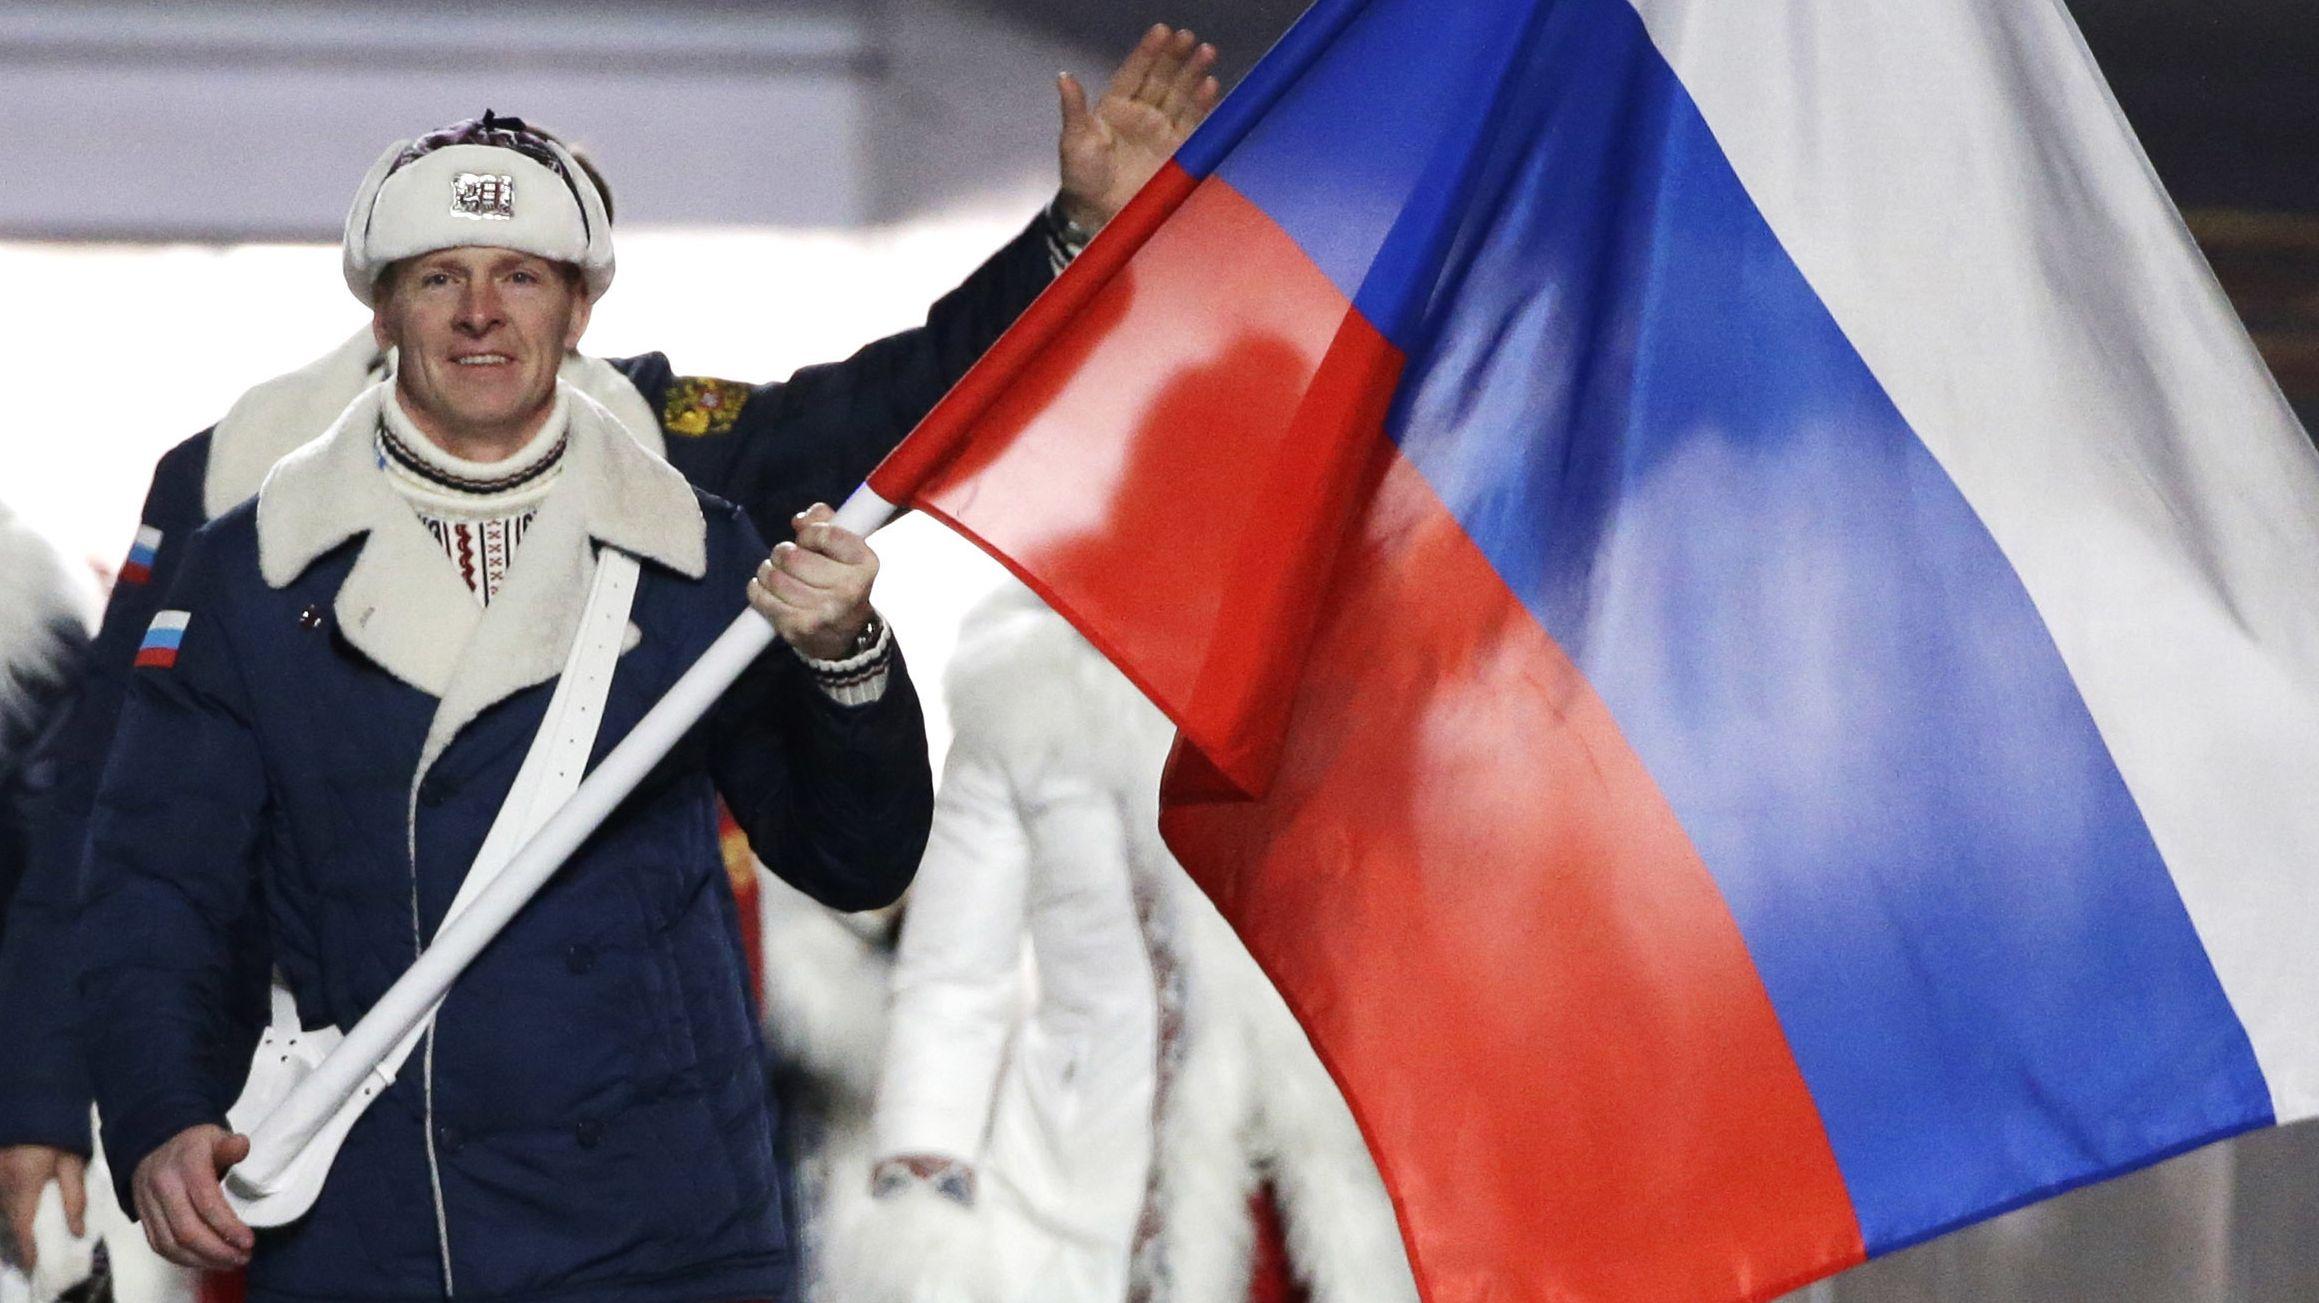 Der russische Athlet Alexander Subkow wurde lebenslänglich wegen Dopings gesperrt